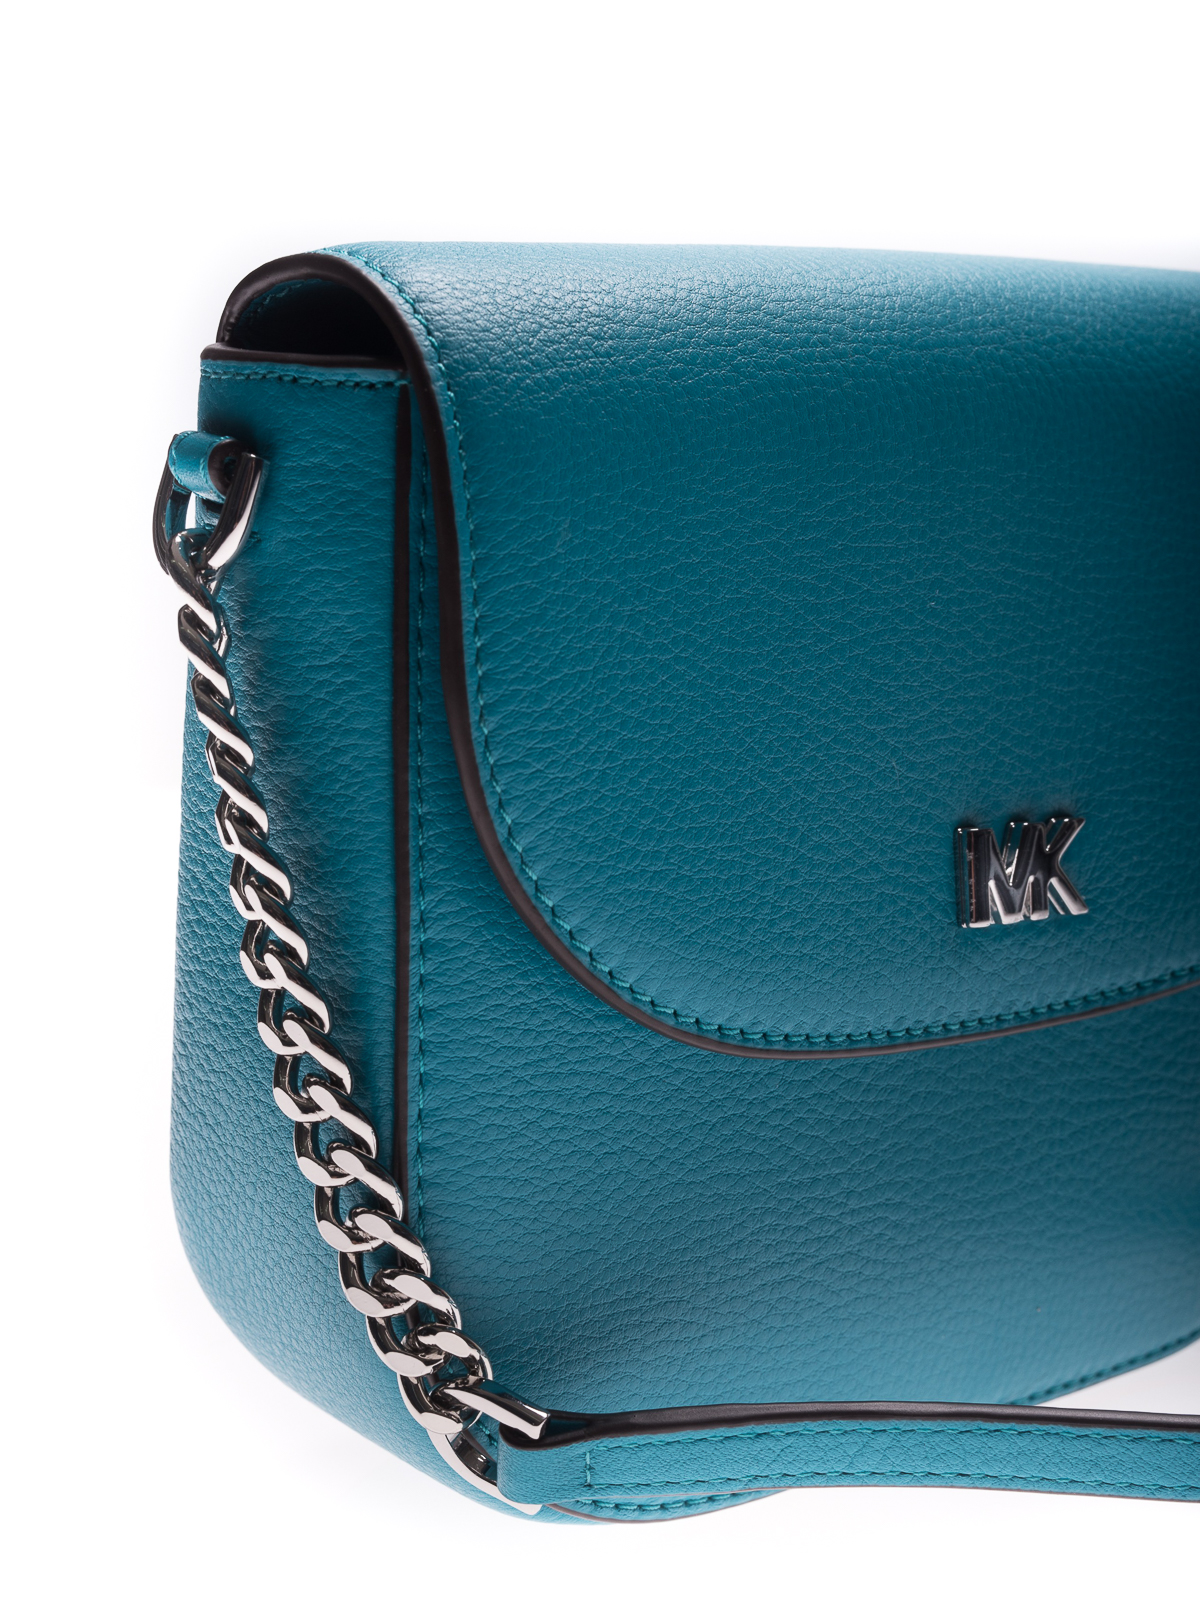 bfa443c35d73 Michael Kors - Mott blue leather dome crossbody - cross body bags ...